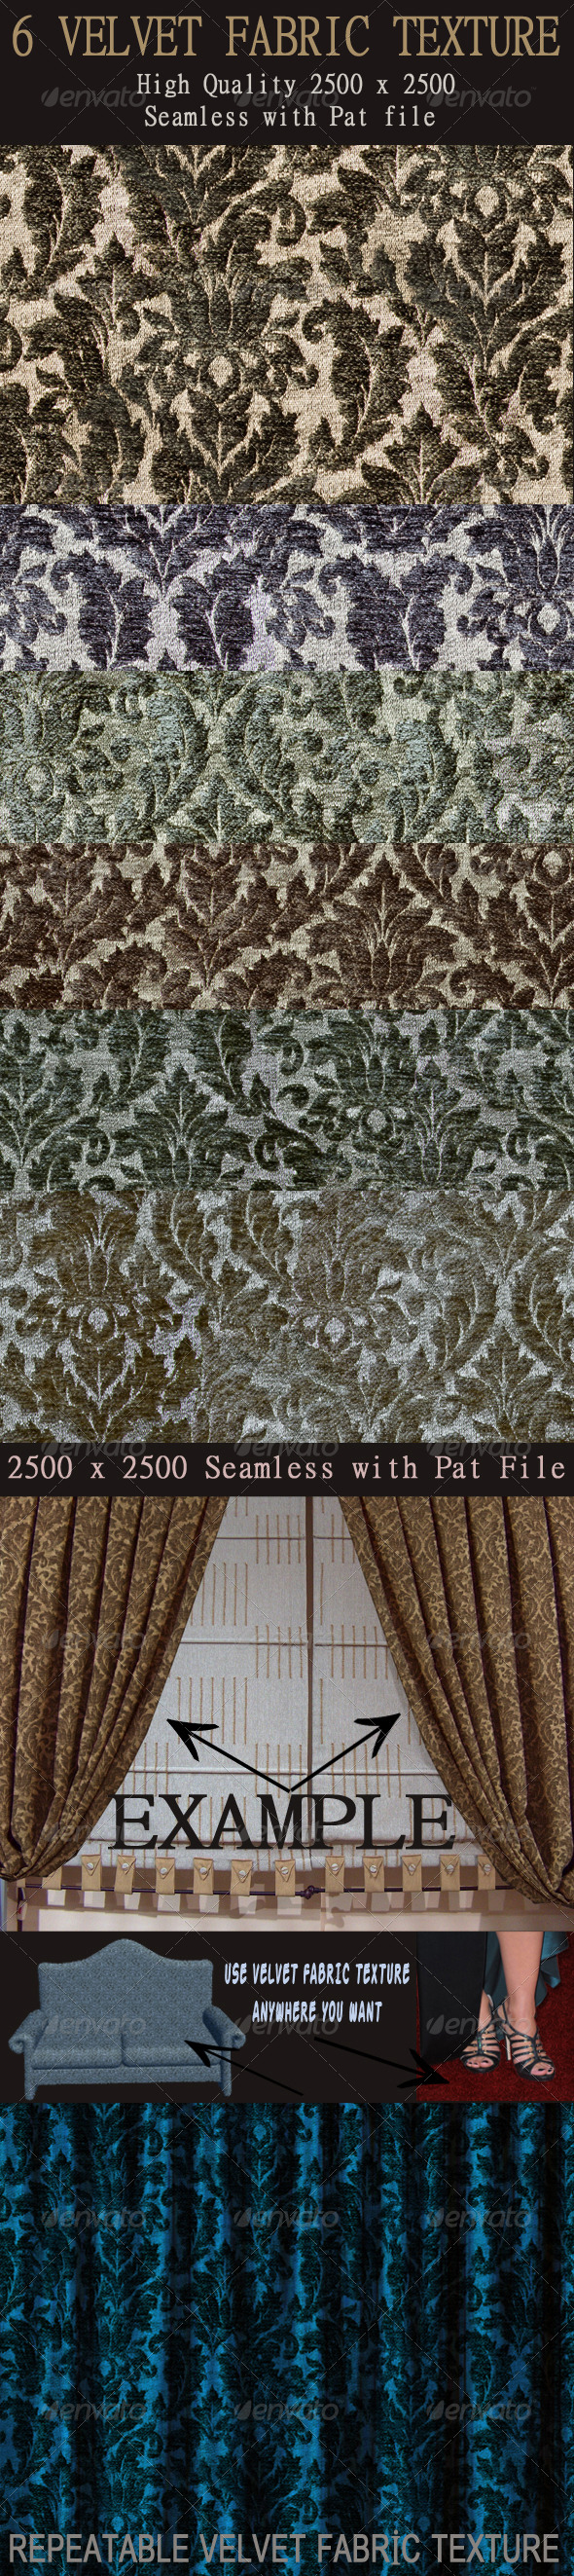 6 Seamless Velvet Fabric Textures - Fabric Textures